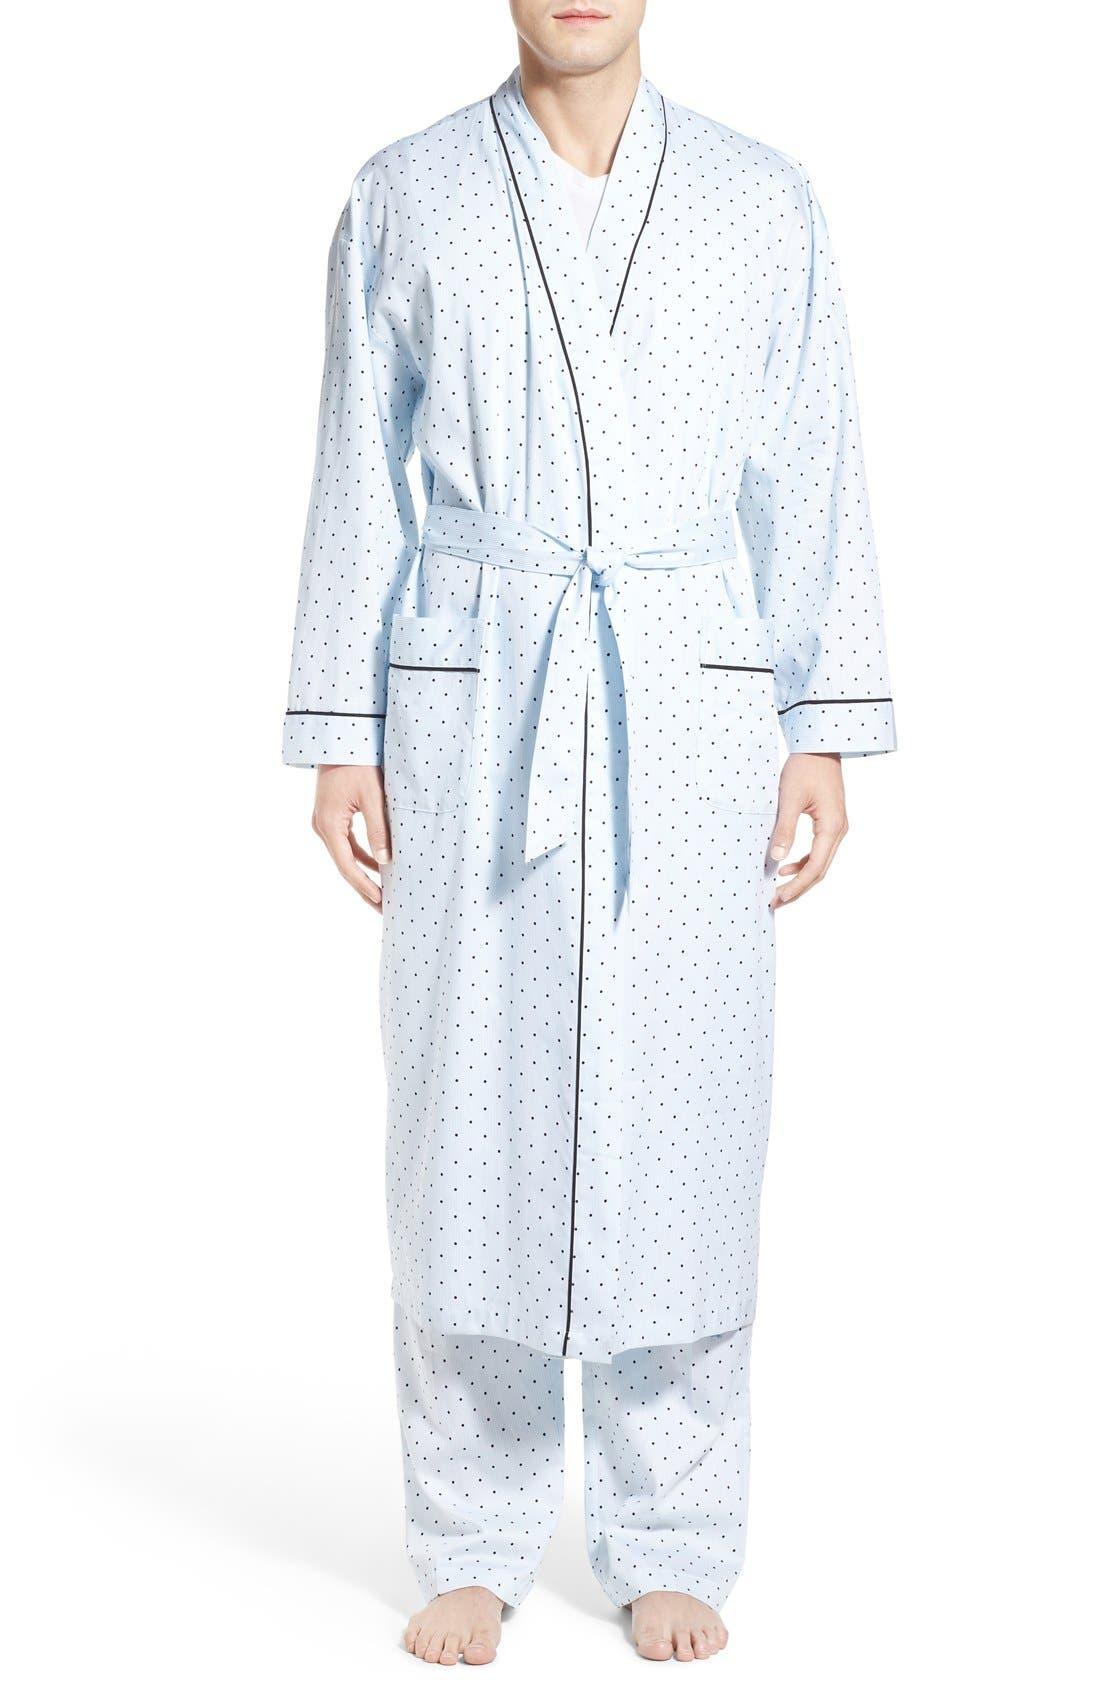 MAJESTIC INTERNATIONAL Twilight Blue Cotton Robe